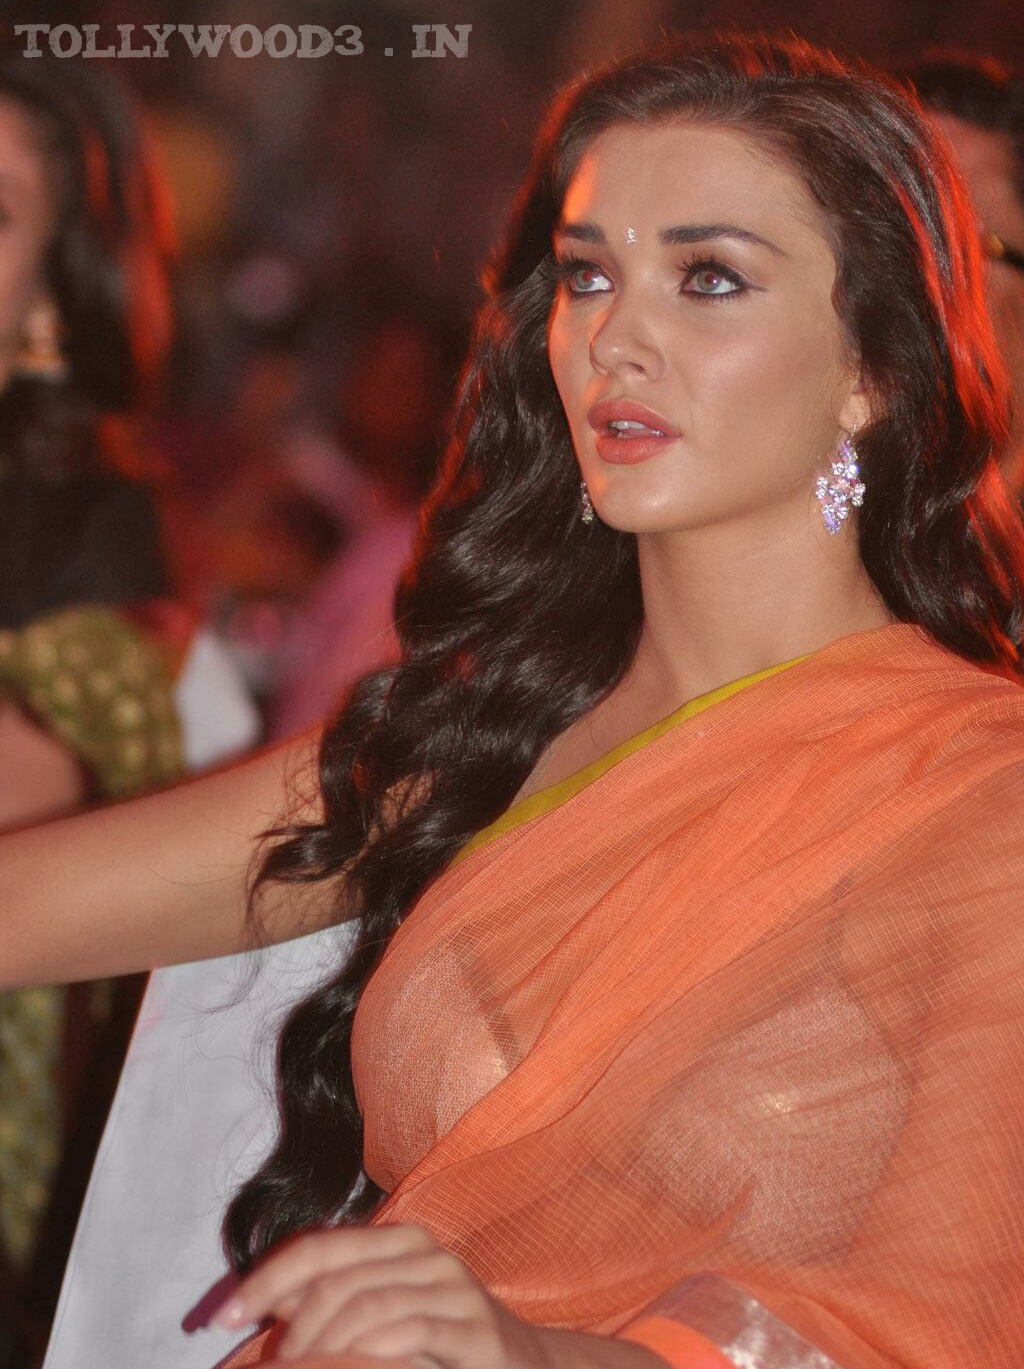 Jackson hot hd photos in transparent orange saree amy jackson hot hd photos in transparent orange saree voltagebd Gallery